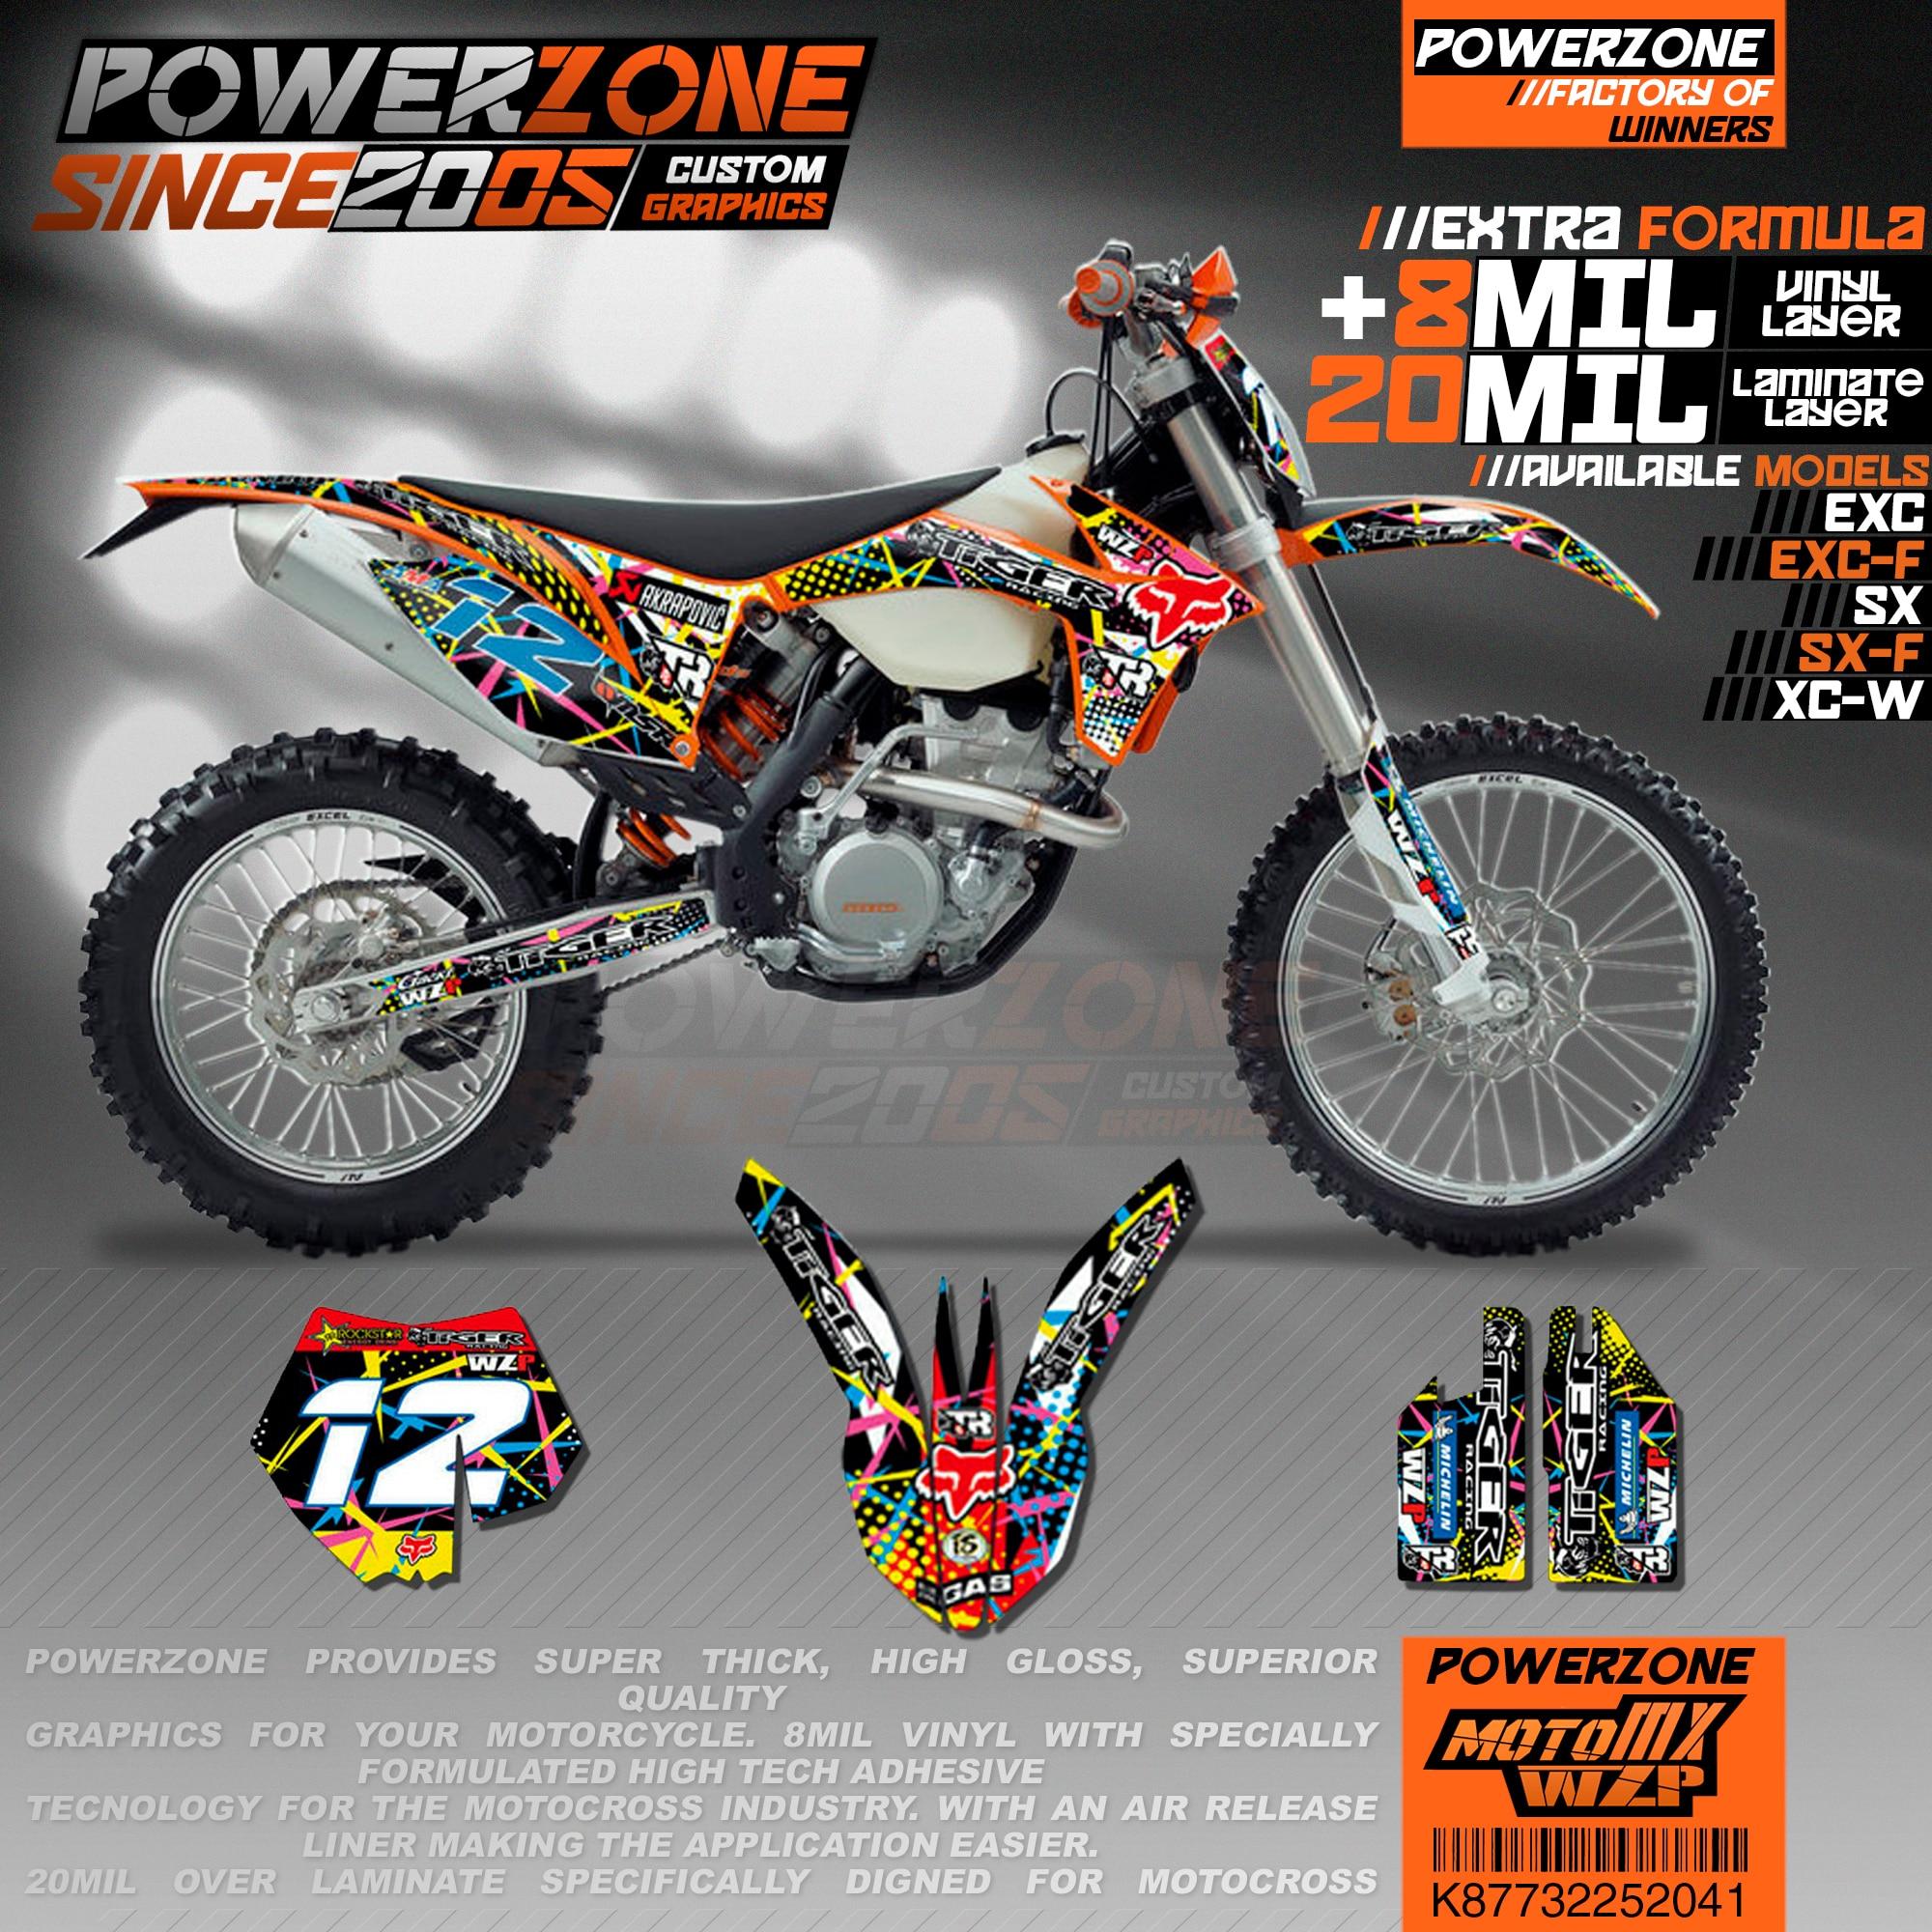 PowerZone Custom Team Graphics Backgrounds Decals 3M Stickers Kit For KTM SX SXF MX EXC XCW